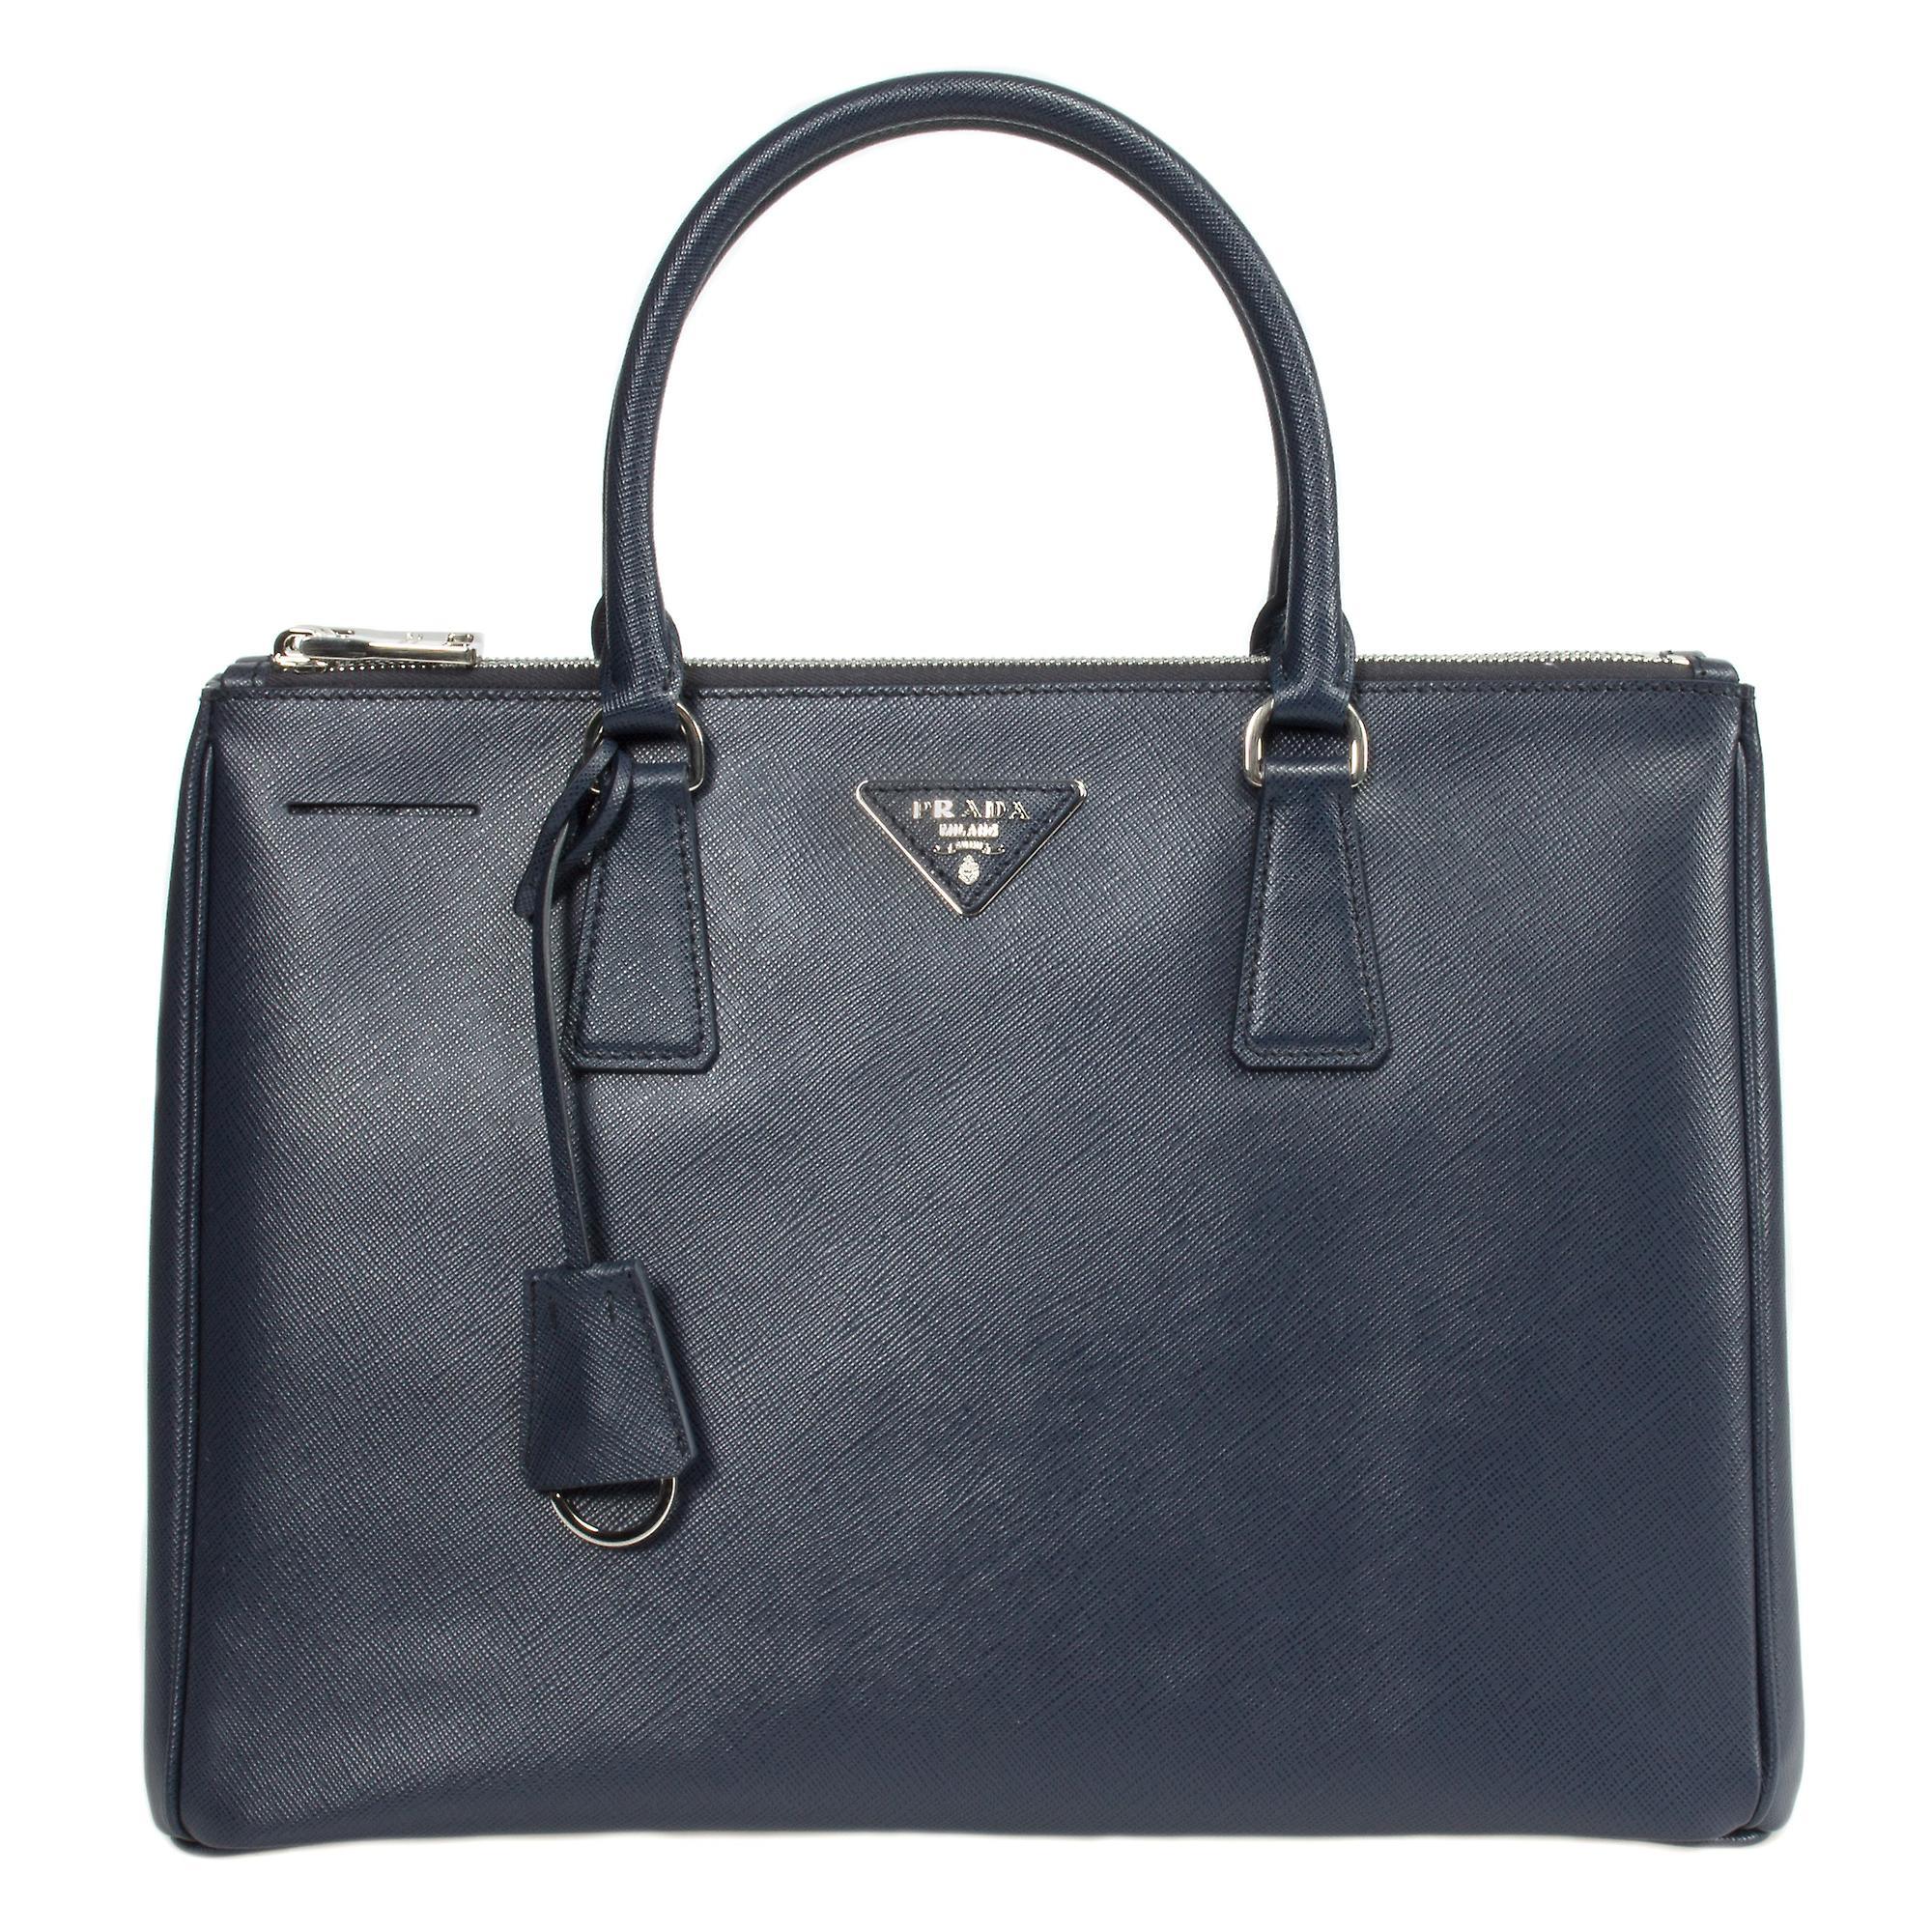 Prada Galleria Saffiano Leather Bag Model 1BA274 | Navy (Baltico) w/ Silver Hardware